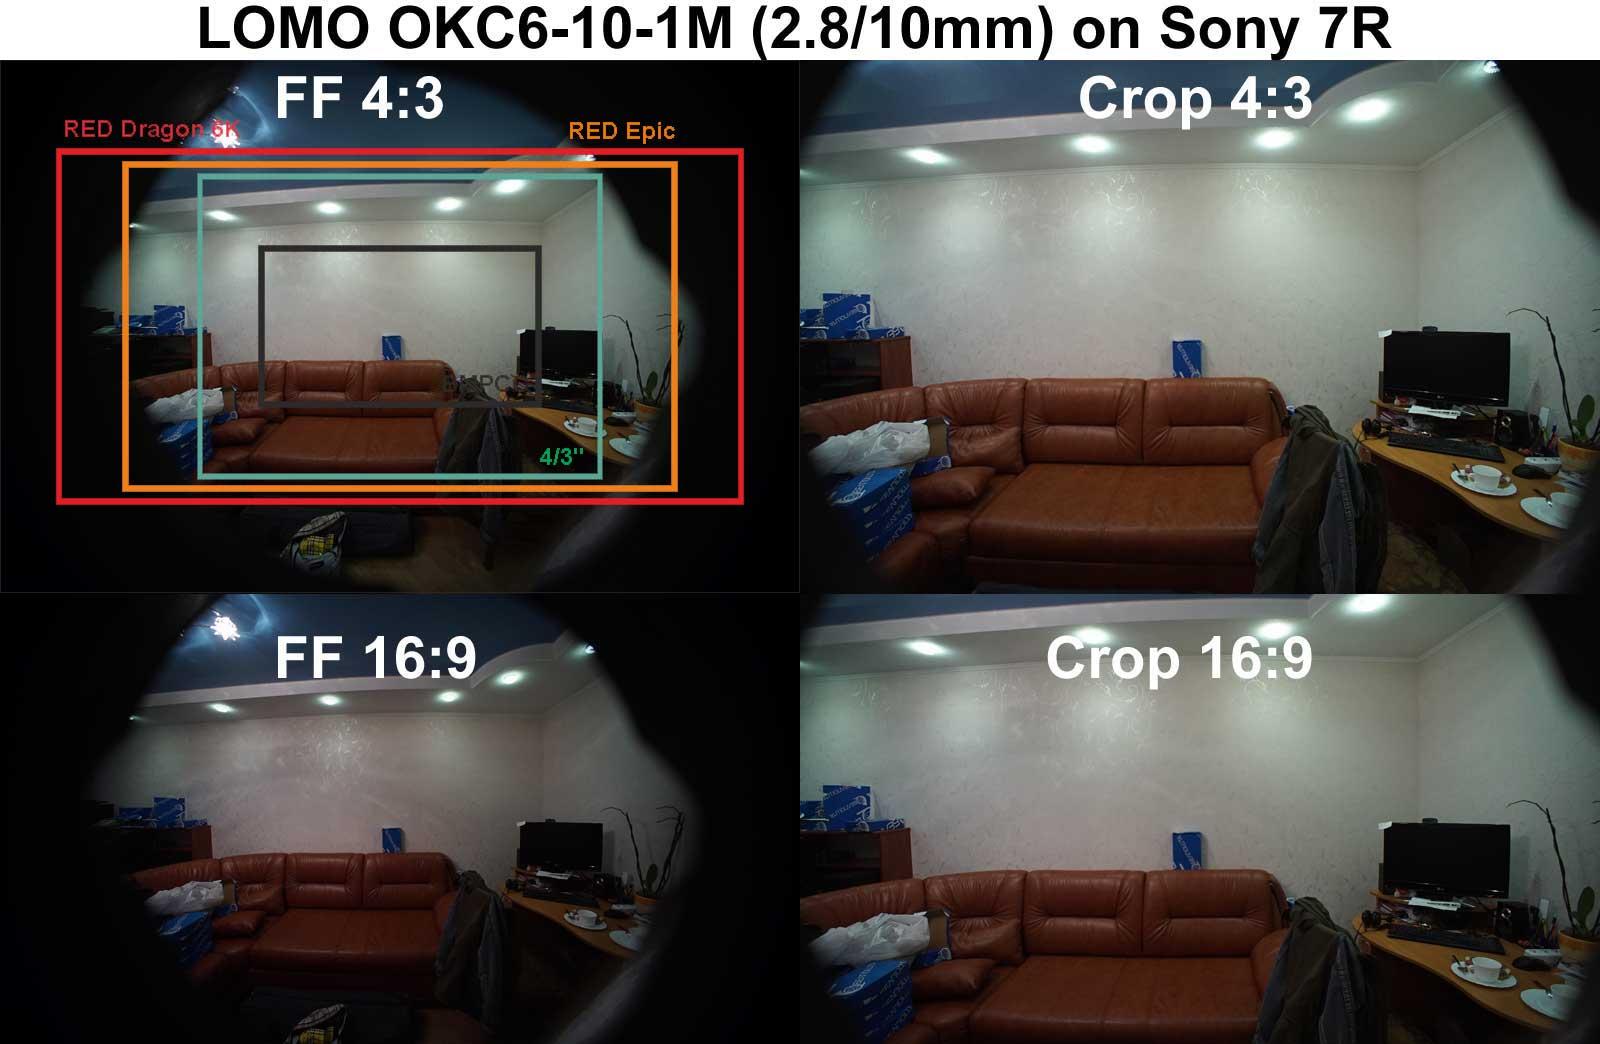 Coverage of LOMO OKC6-10-1M lens on Sony 7R camera